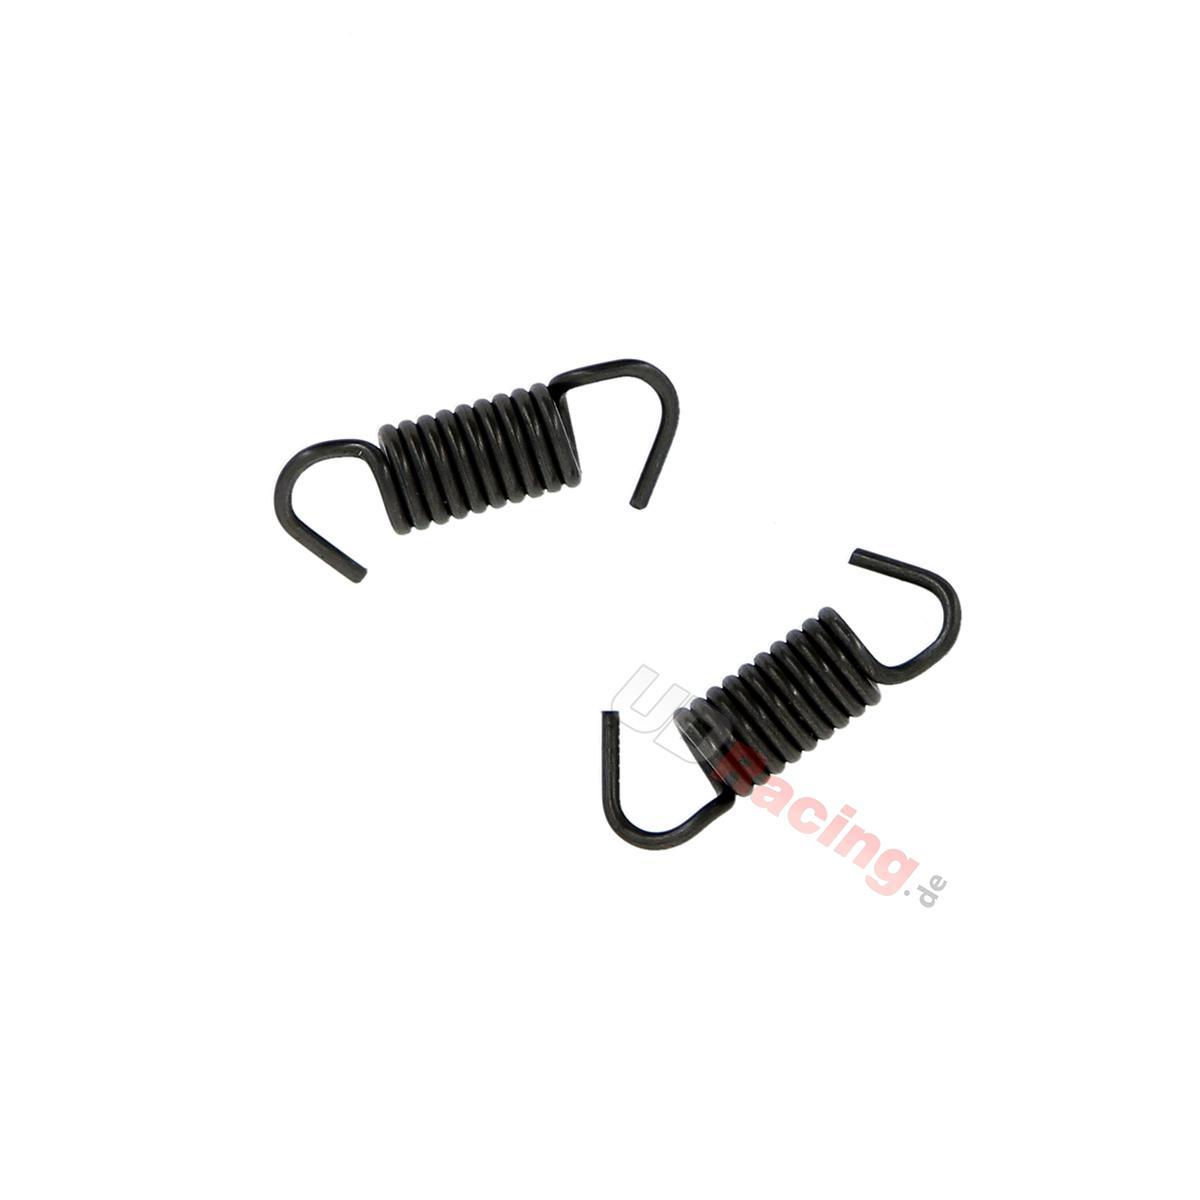 2 Federn für Bremsbacken Motorroller Baotian BT49QT-9